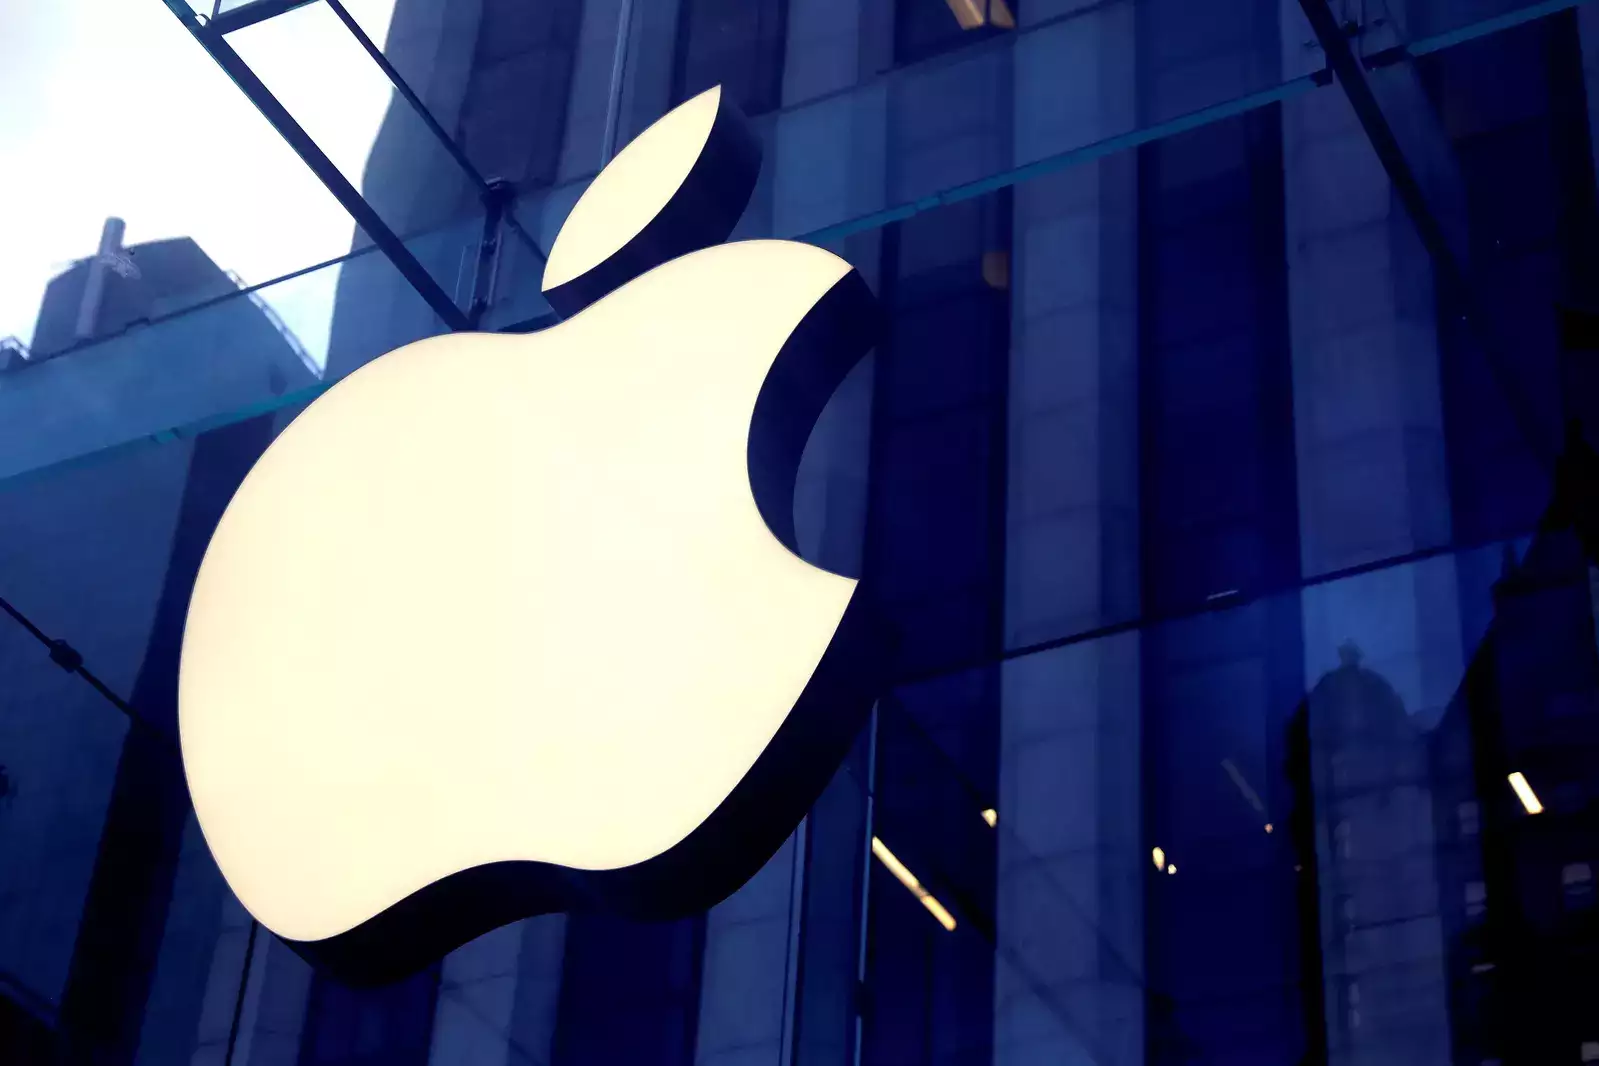 Apple Hires Ex-BMW Exec Kranz For Its Electric Car Project